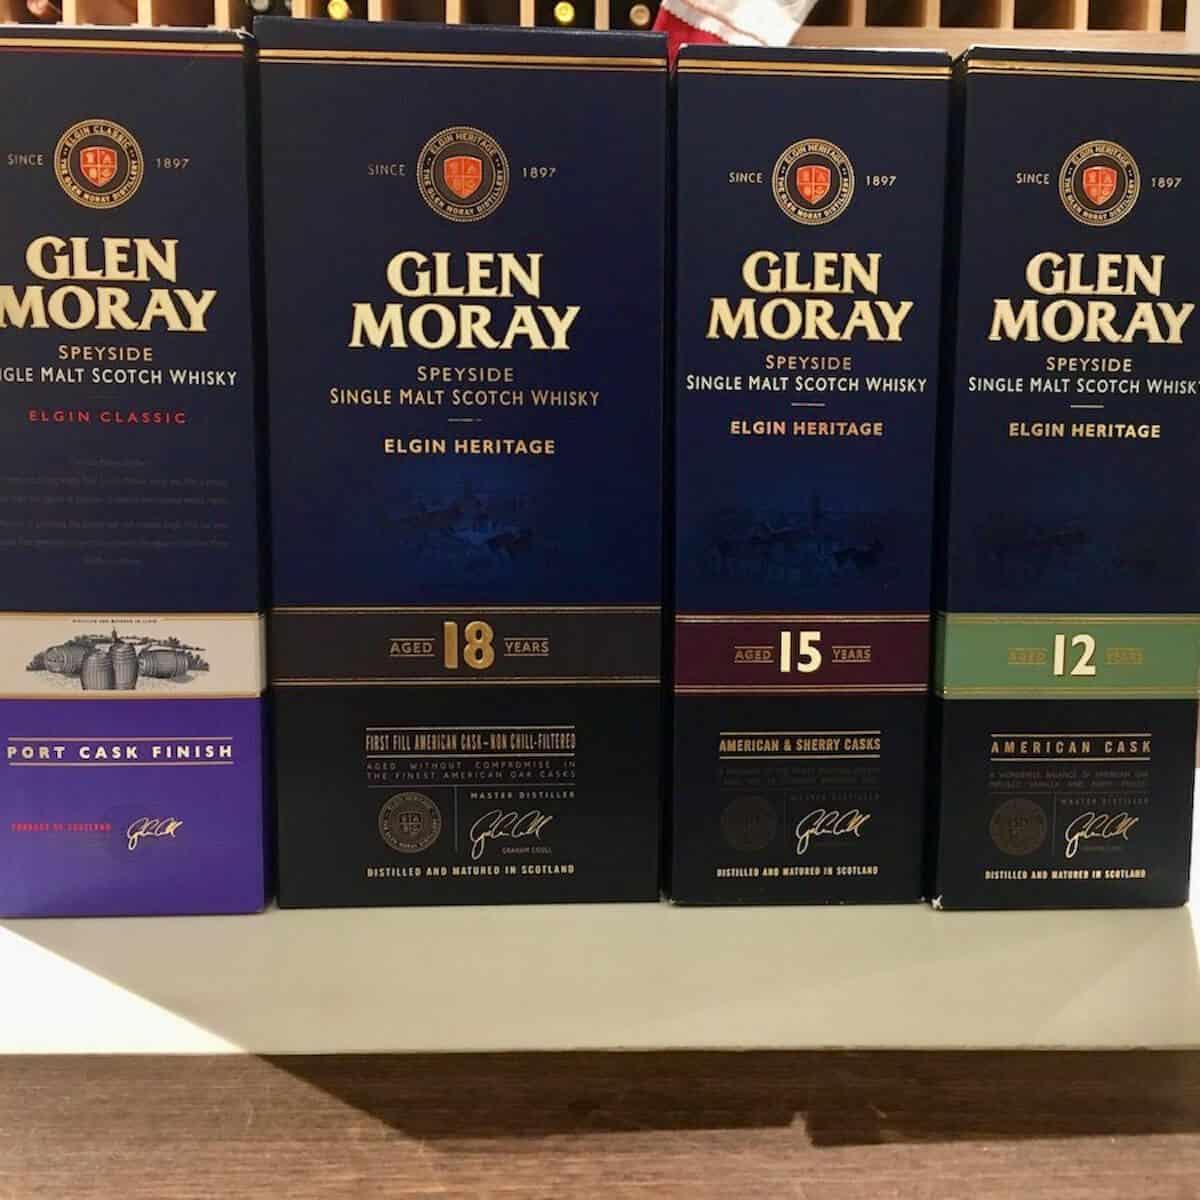 Glen Moray whisky box lineup on a counter.